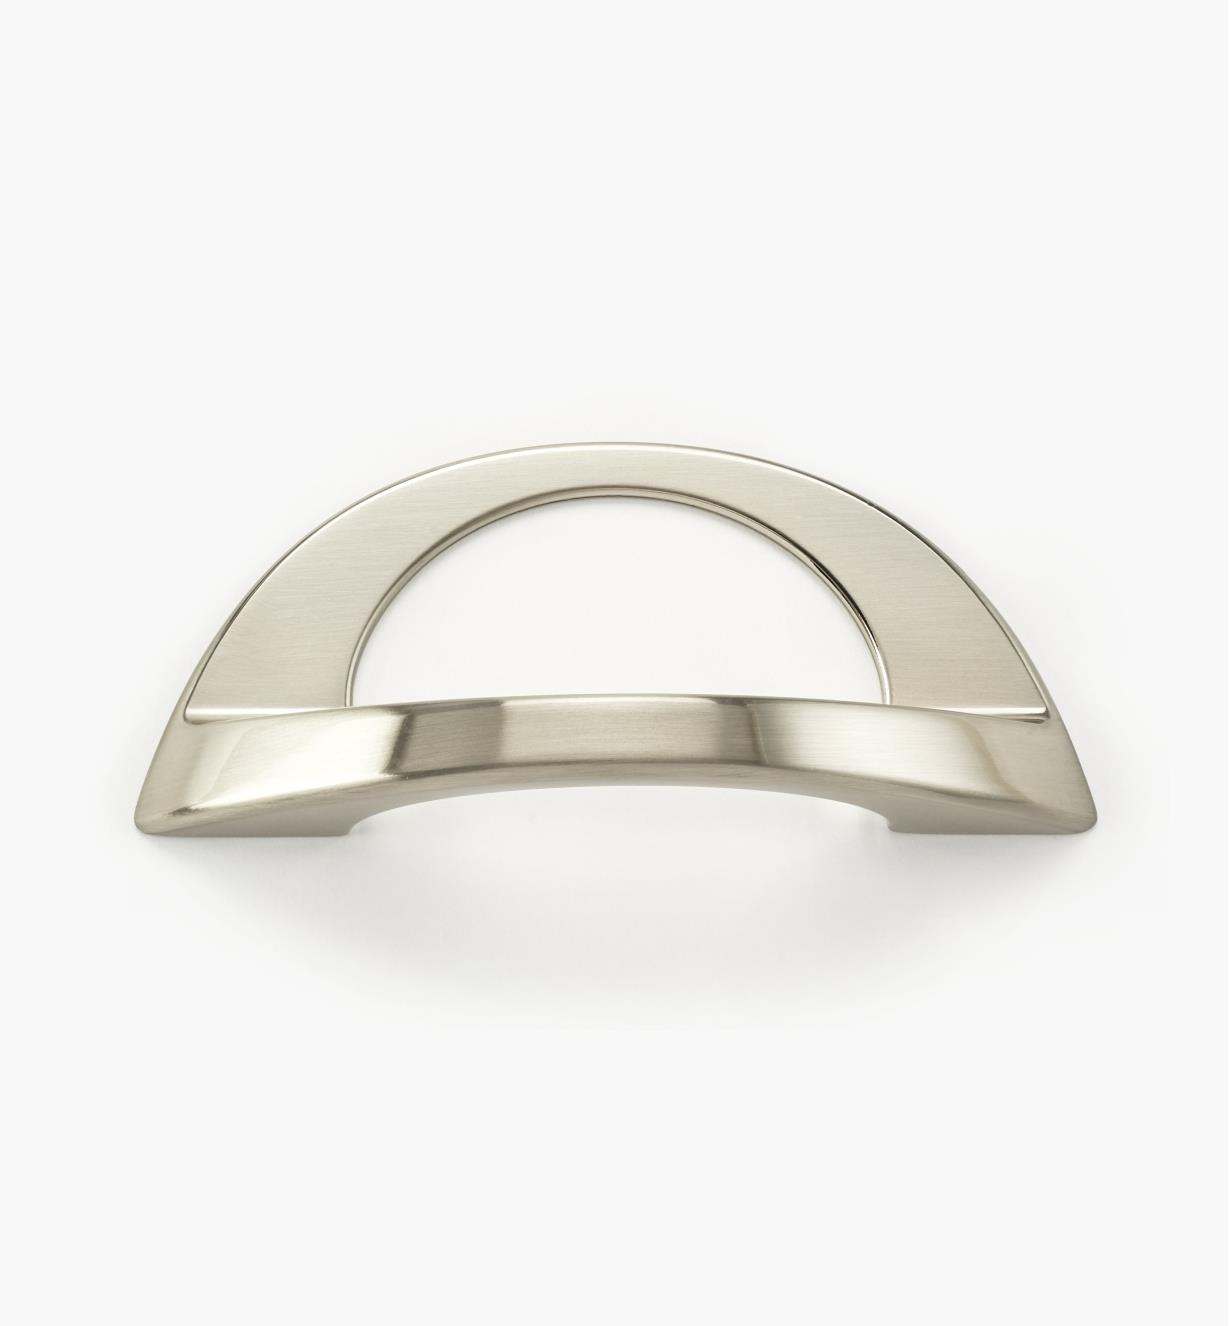 01W0872 - Poignée Polo, fini nickel brossé, 128 mm × 43 mm